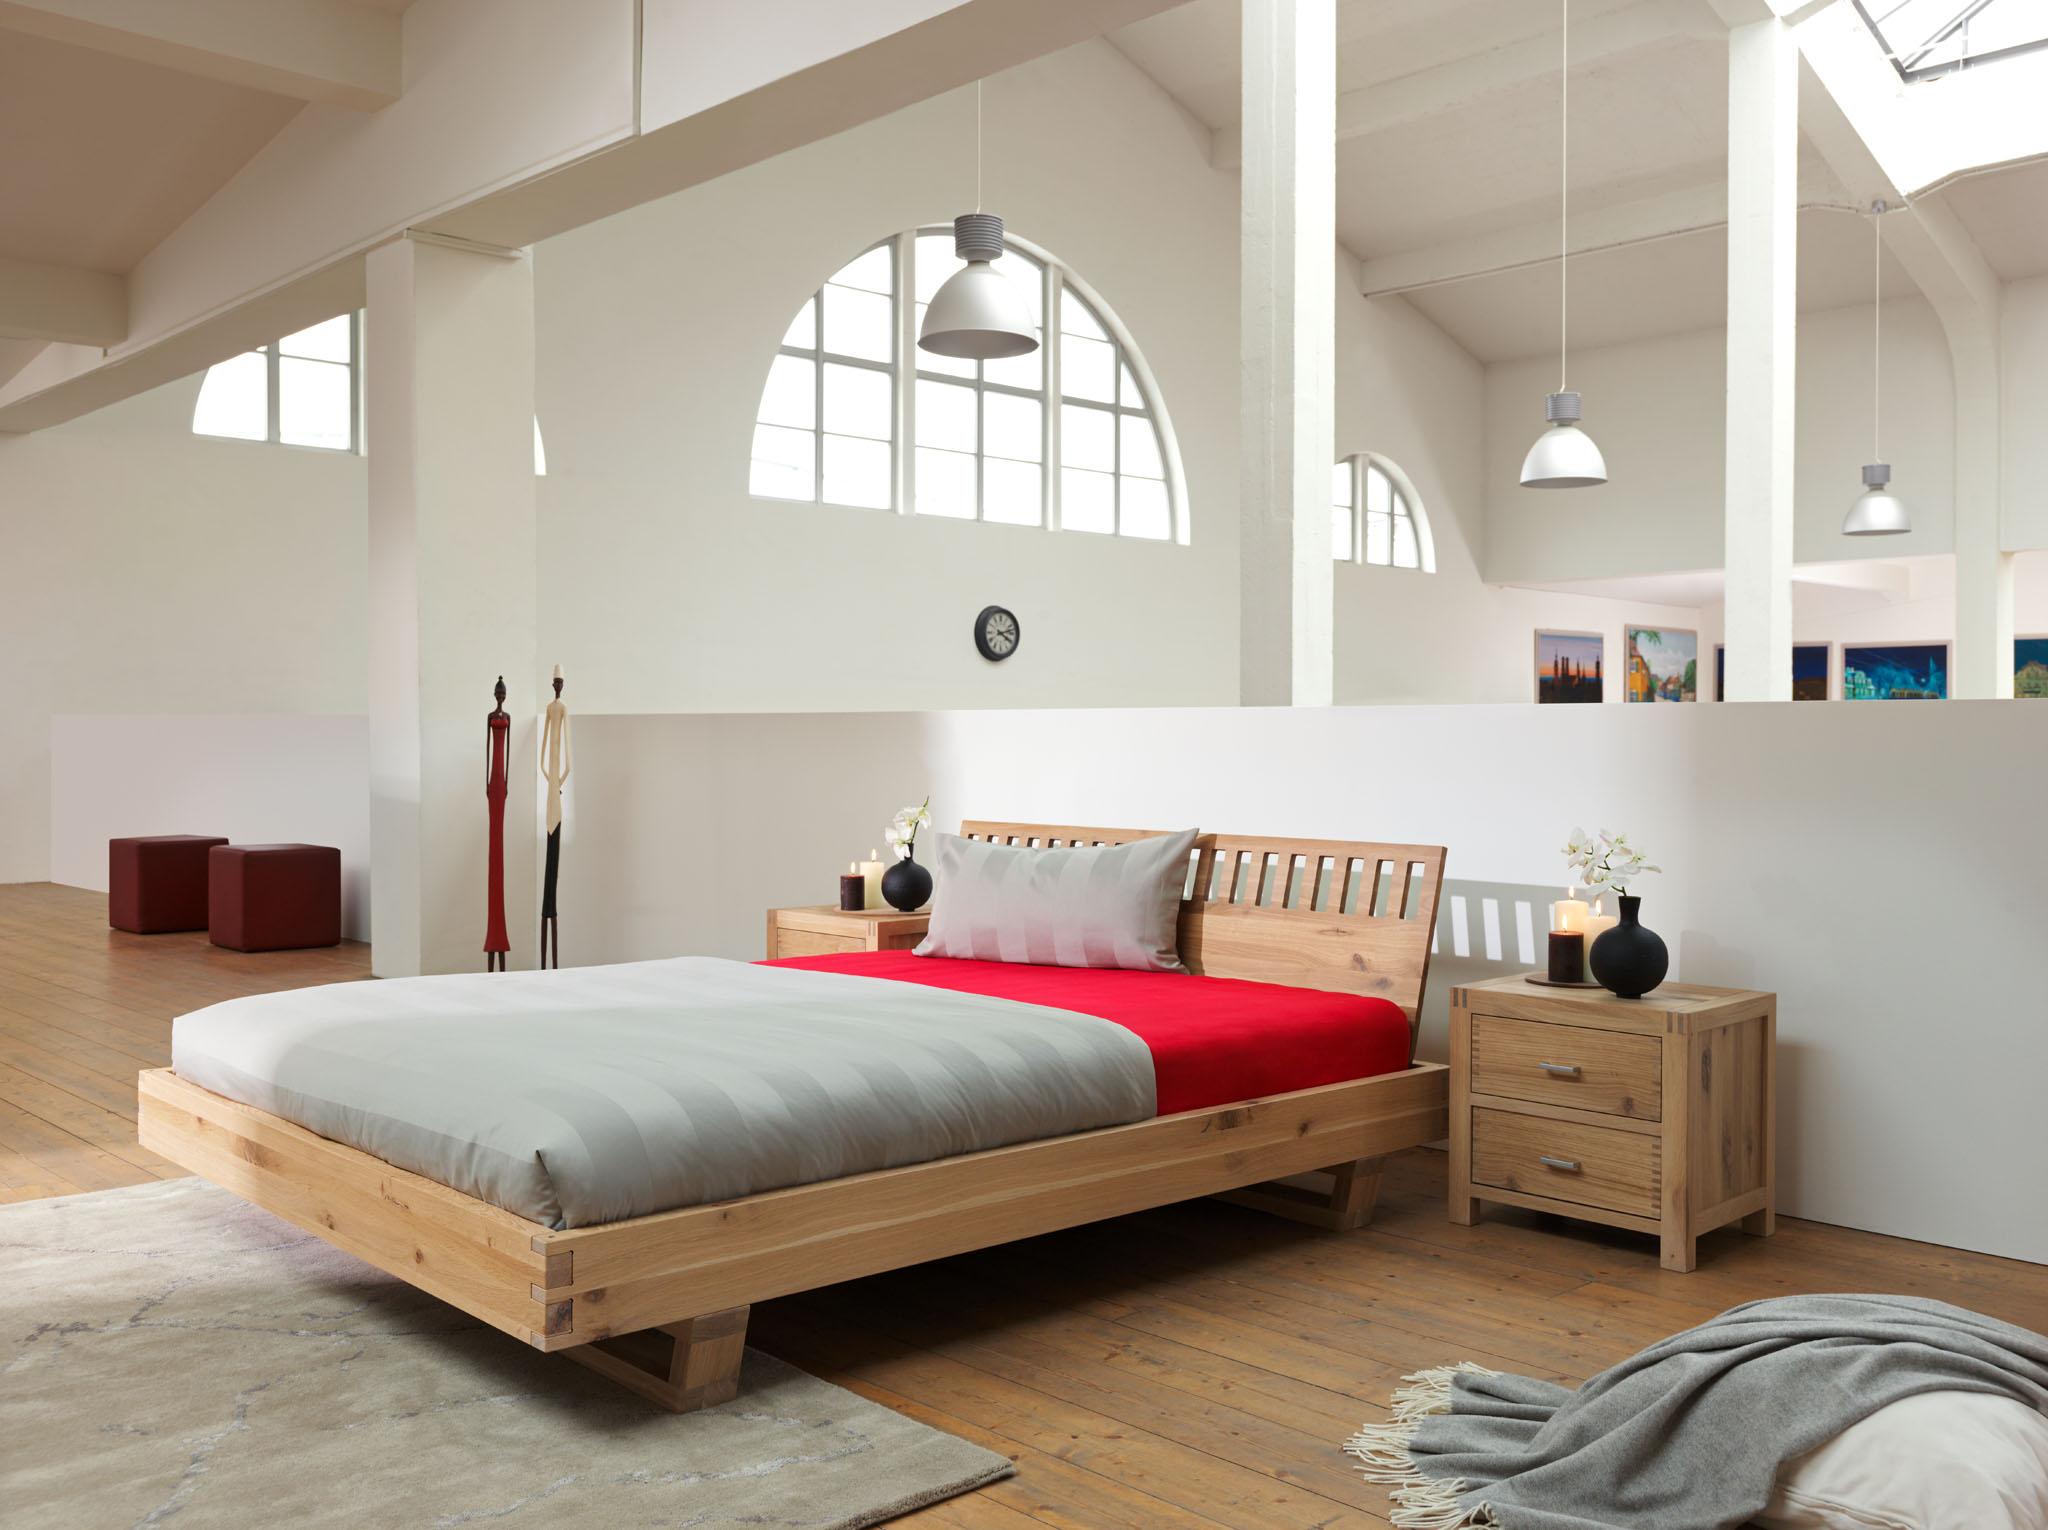 bett in eiche massiv. Black Bedroom Furniture Sets. Home Design Ideas